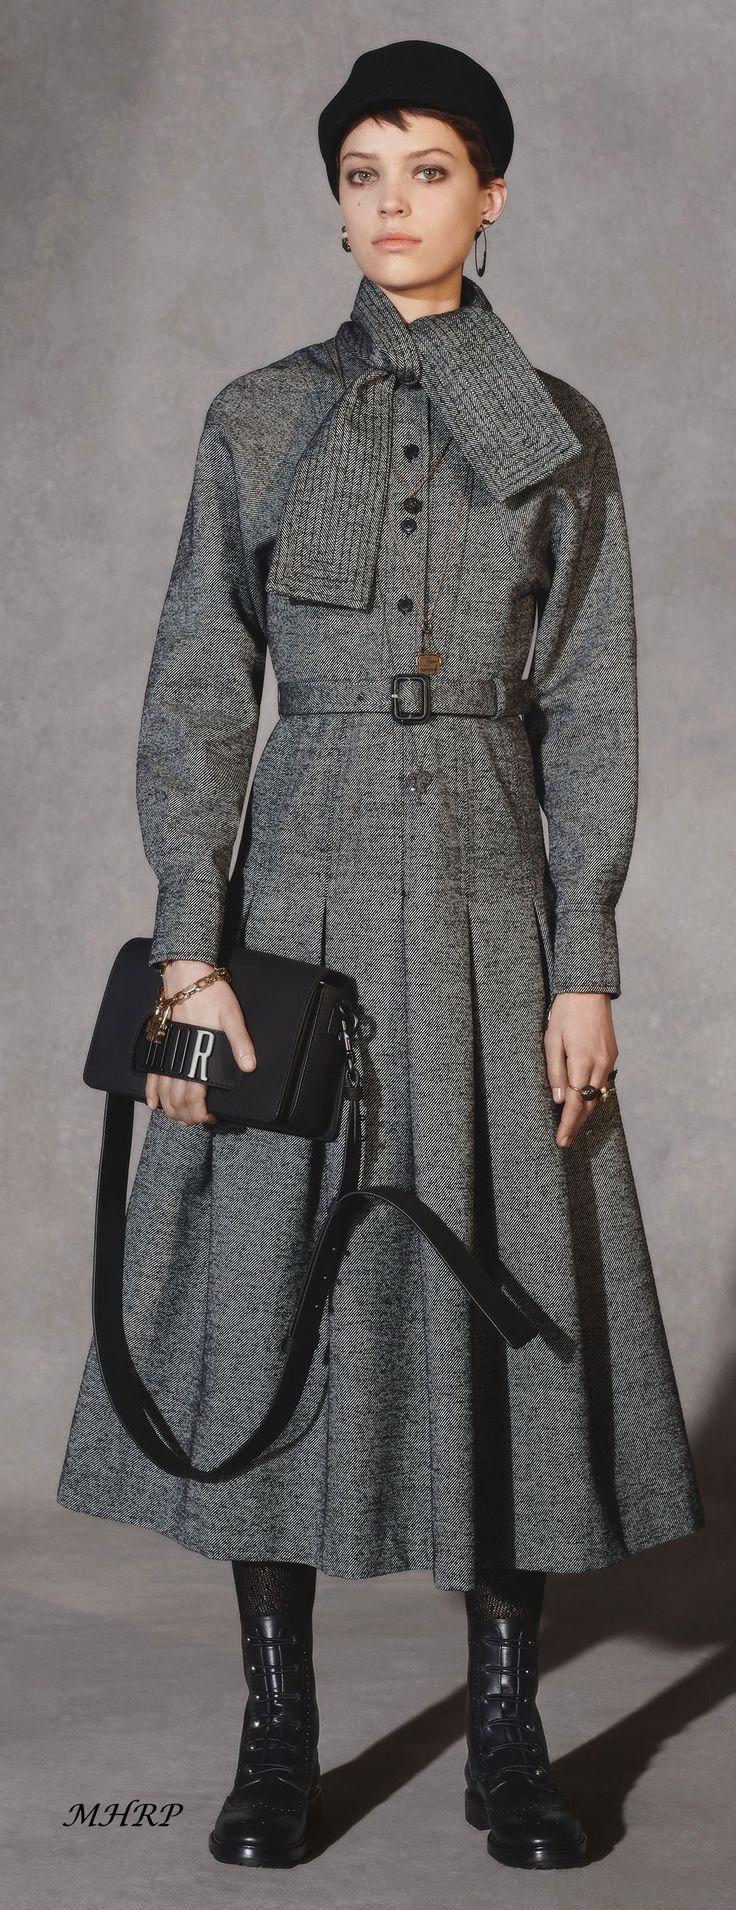 christian-dior-pre-fall-18_image pinned from vogue.com